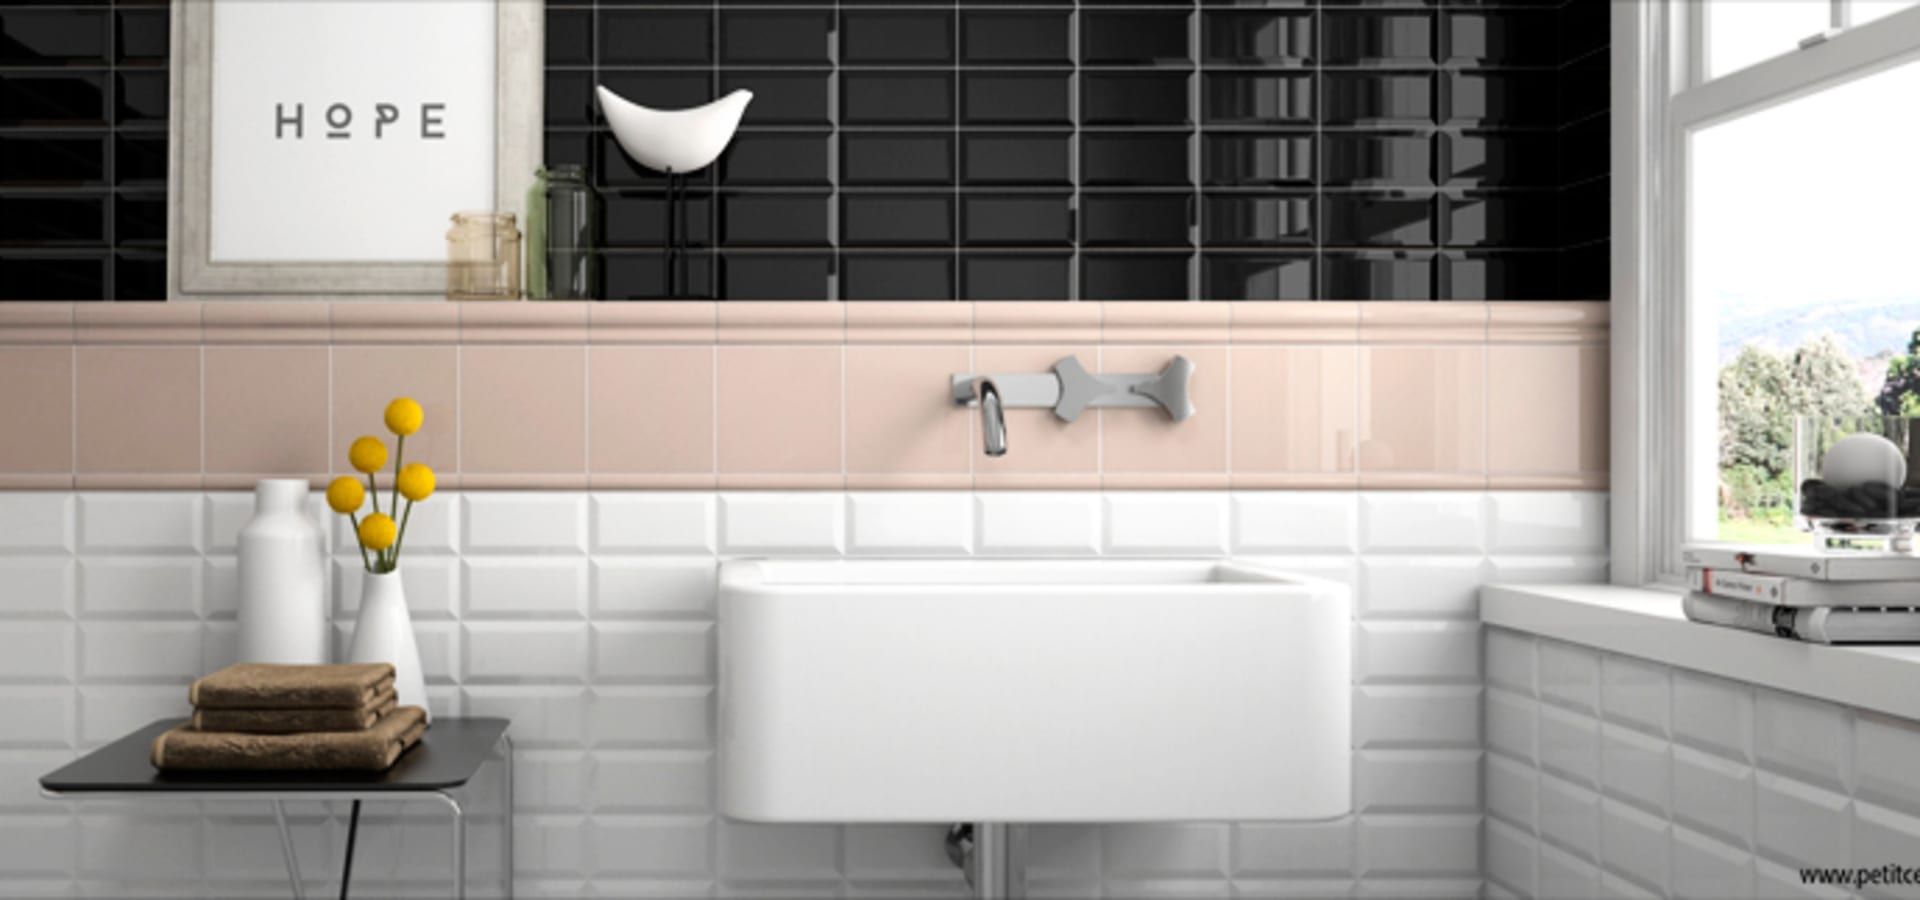 azulejo biselado 7 5x15 por petit ceramic sl homify. Black Bedroom Furniture Sets. Home Design Ideas